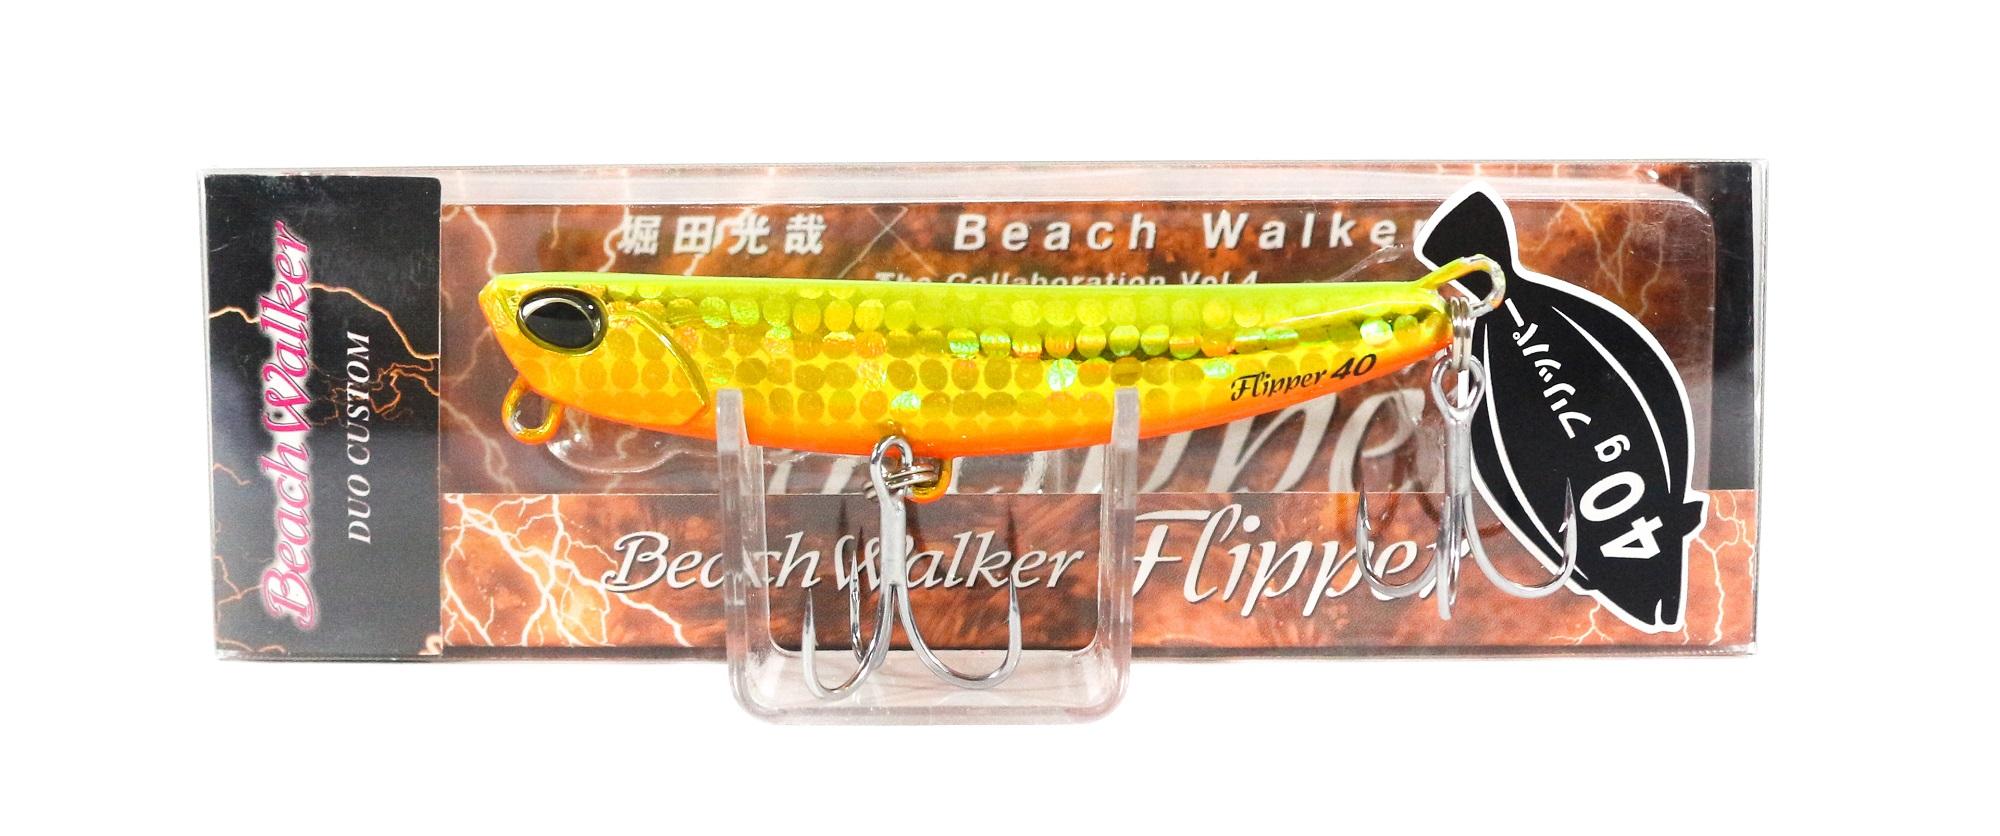 Sale Duo Beach Walker Flipper 40 grams Sinking Lure GQA0063 (3991)